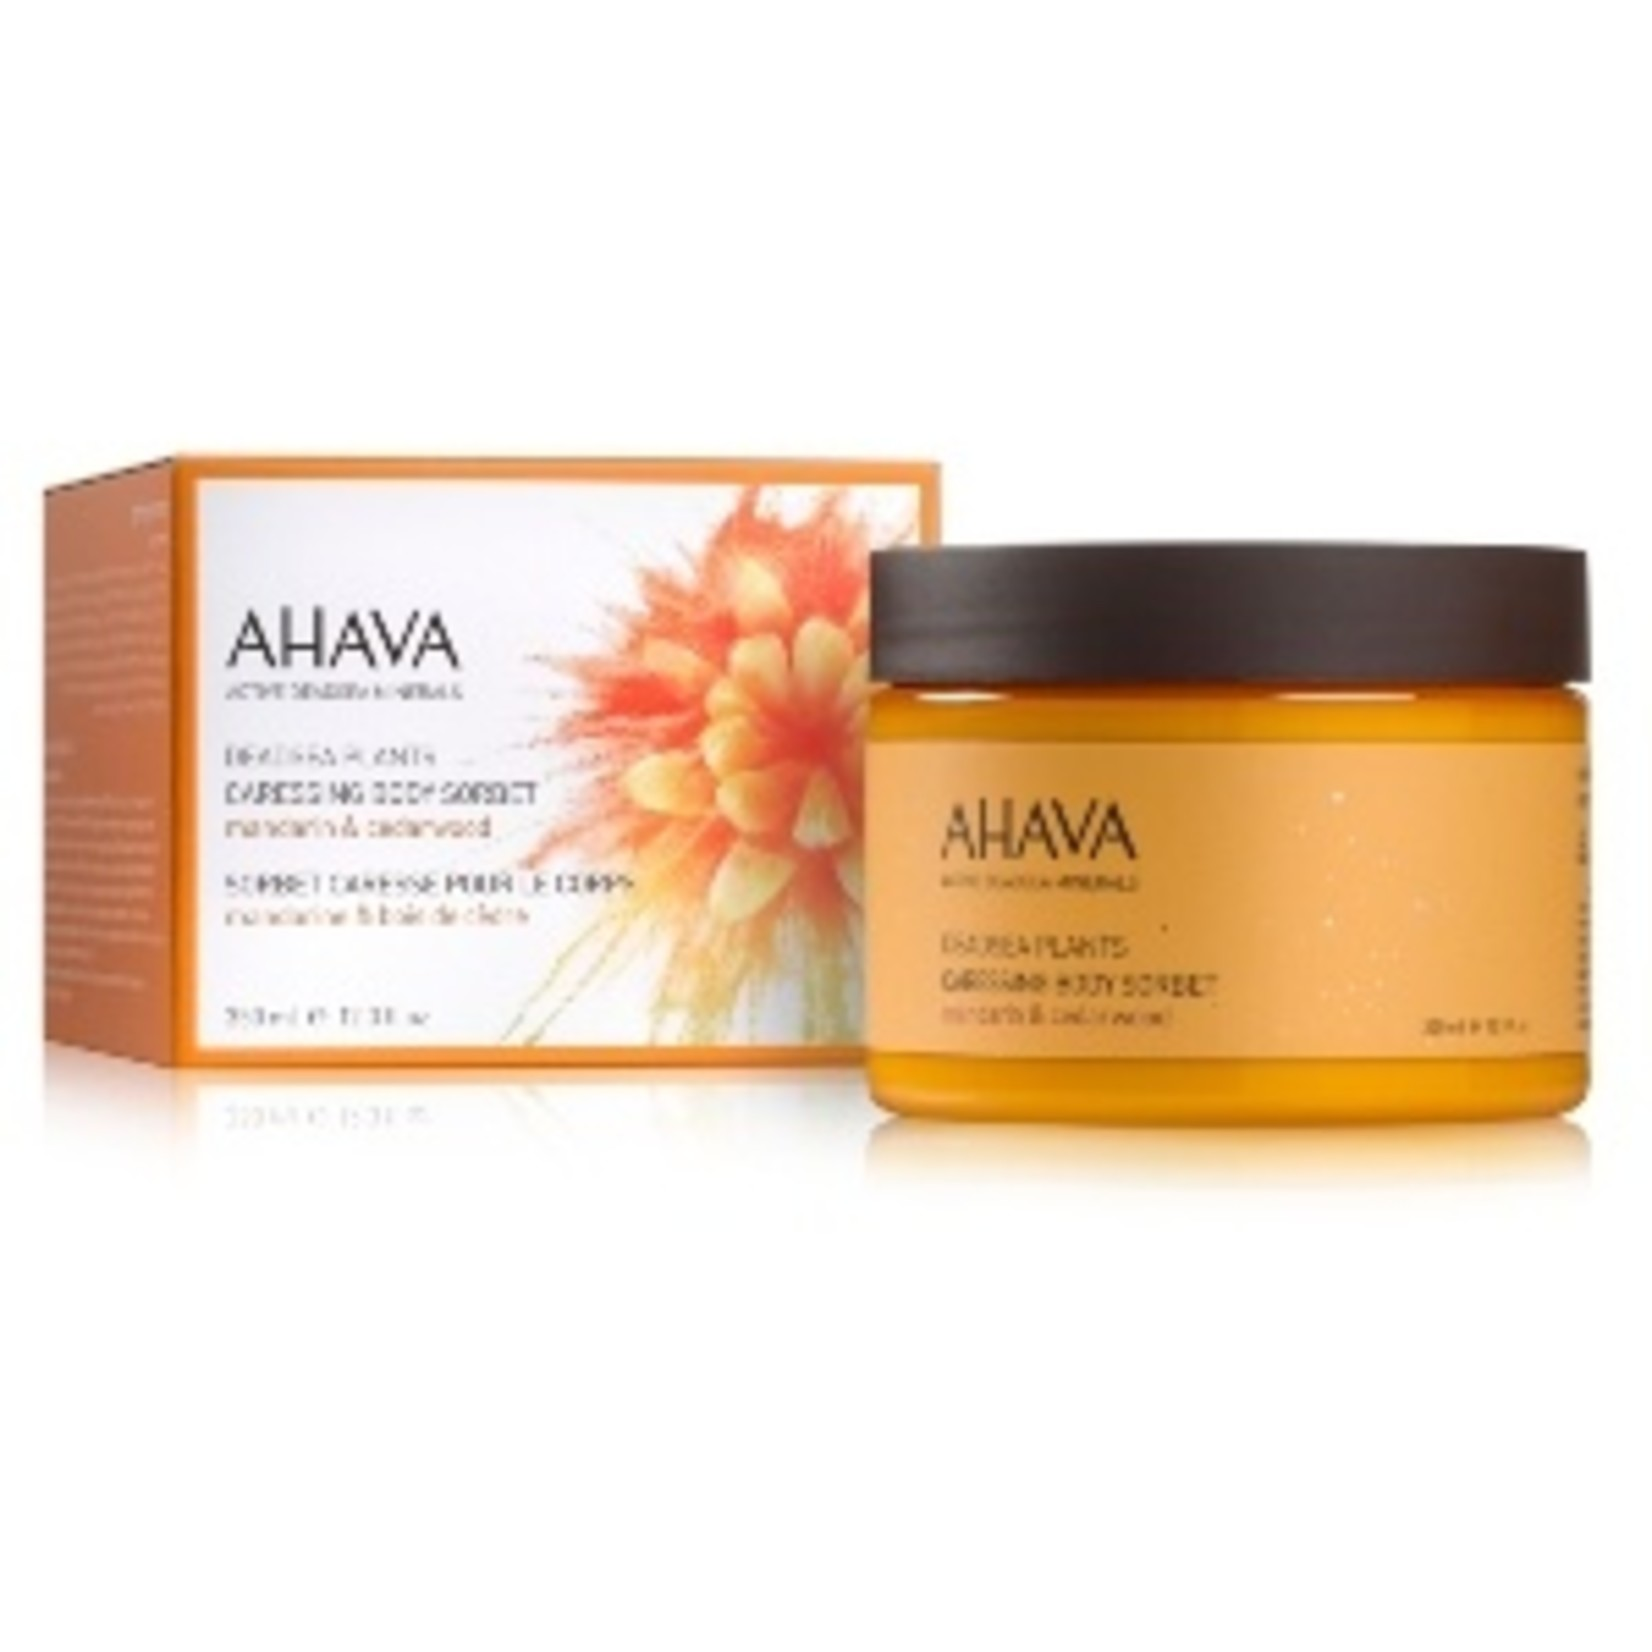 AHAVA caressing body sorbet mandarin& cedarwood 235g